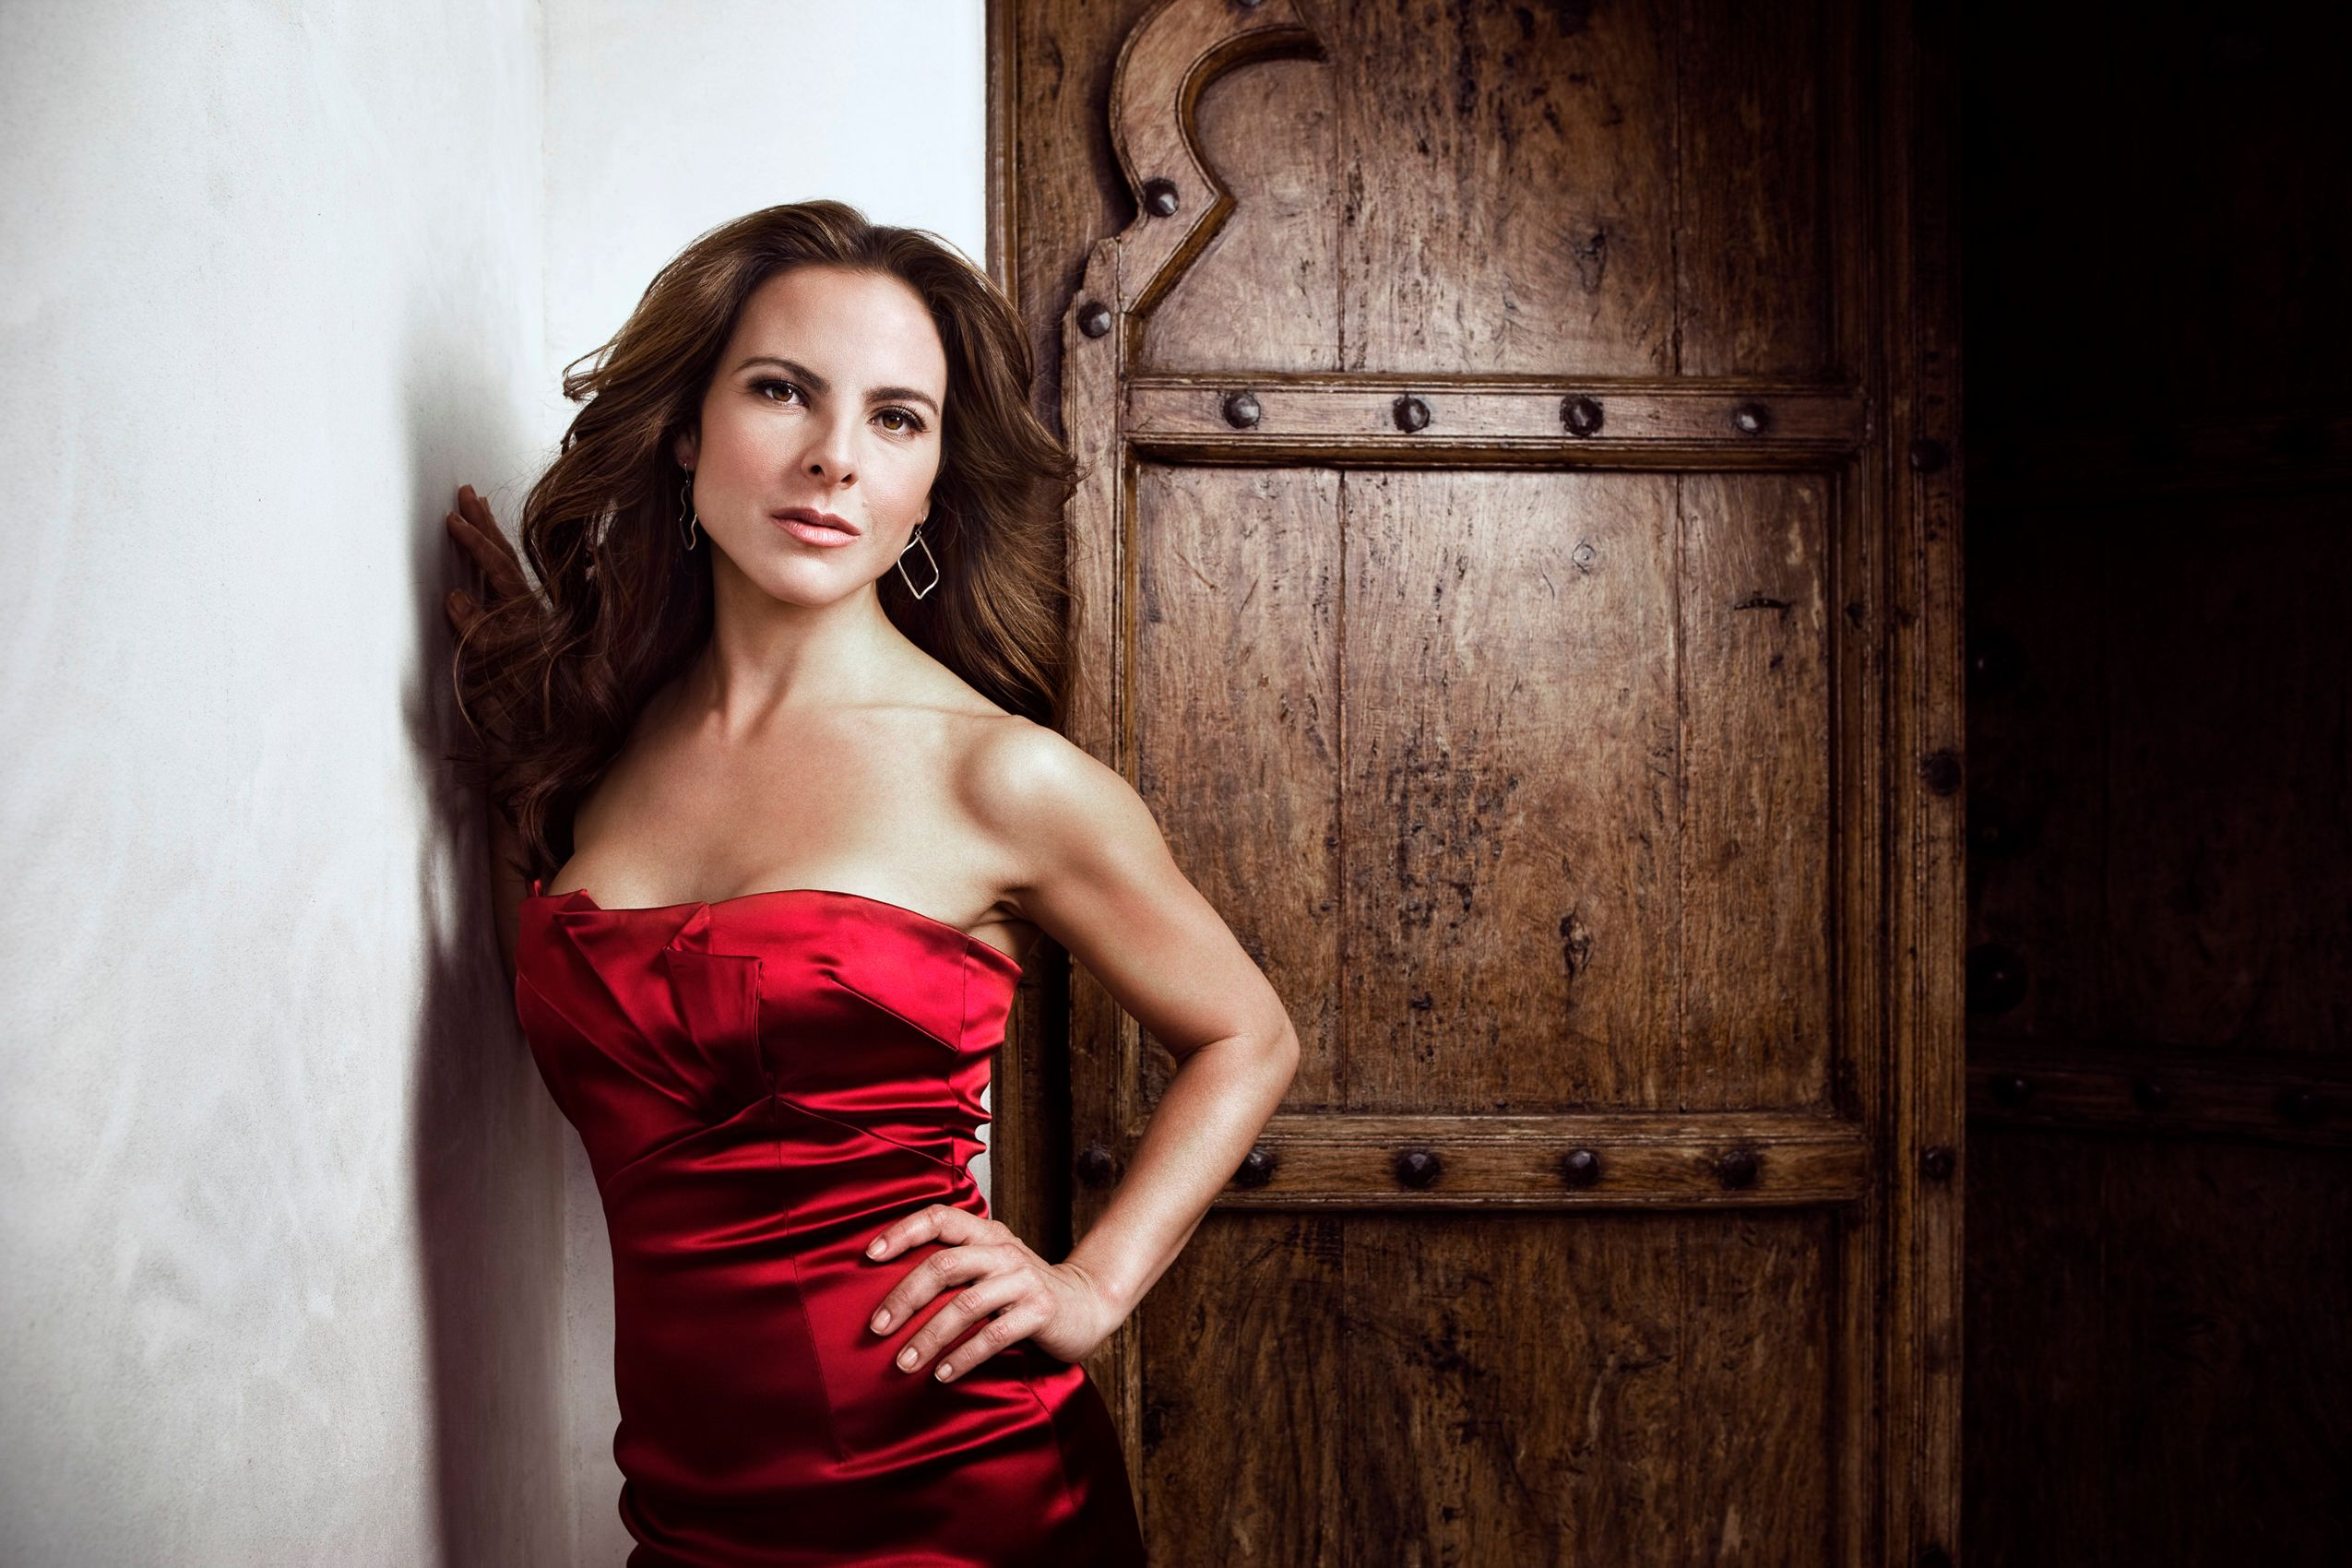 Kate-DelCastillo-el-chapo.jpg